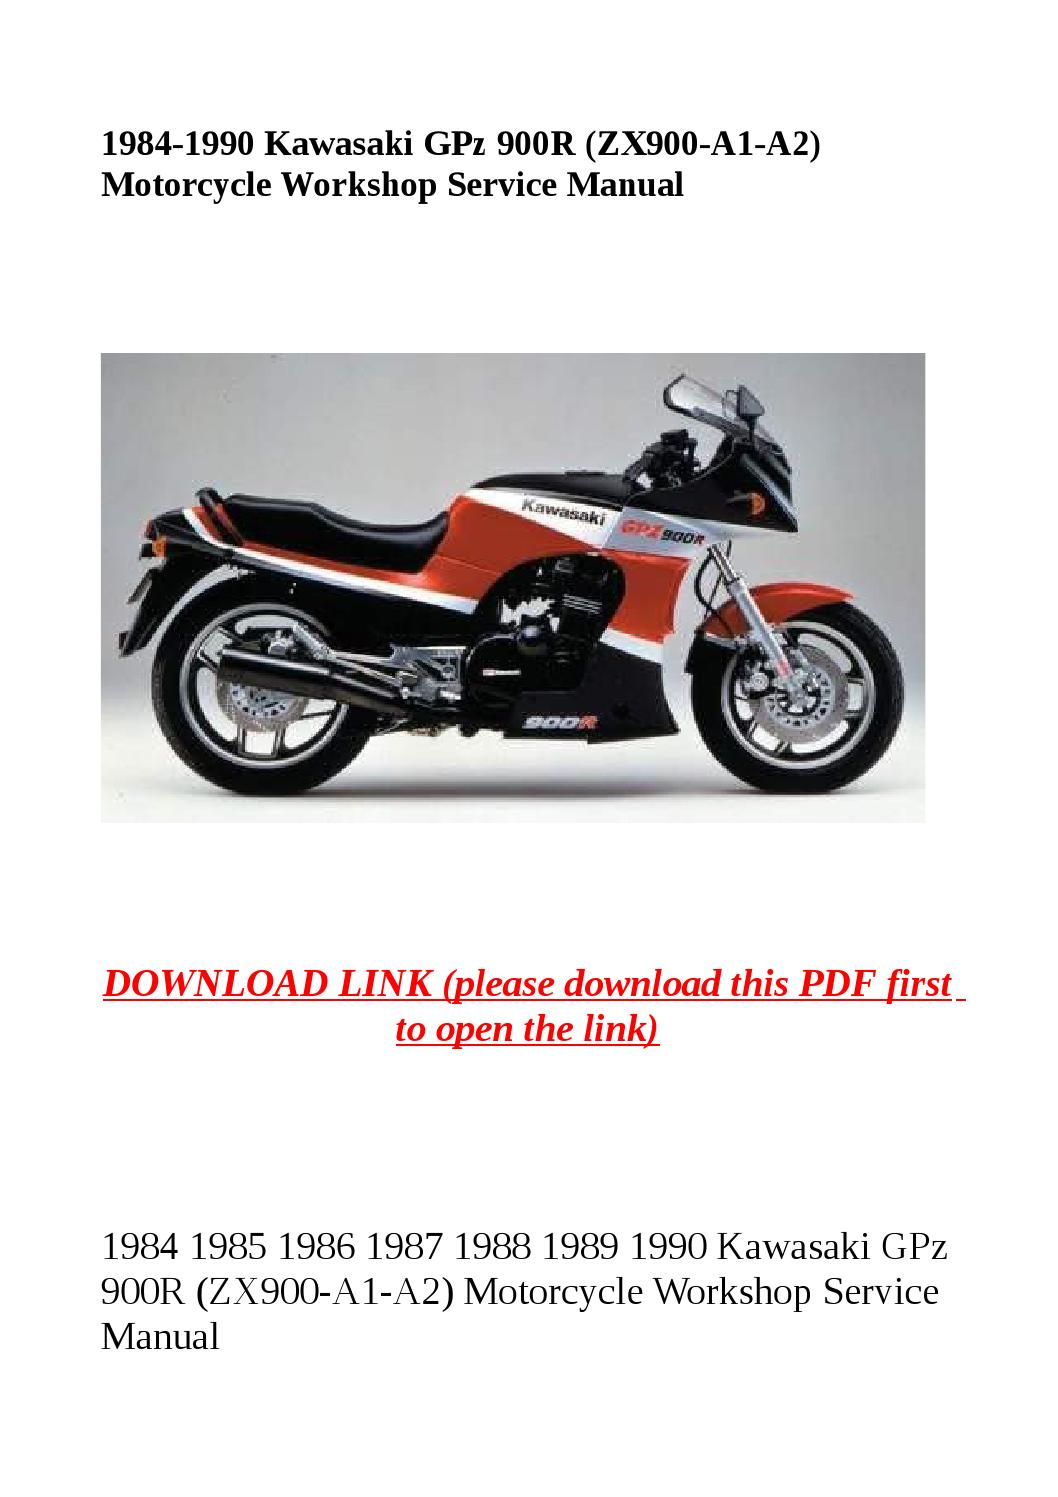 1984 1990 kawasaki gpz 900r (zx900 a1 a2) motorcycle workshop service manual  by yghj - issuu